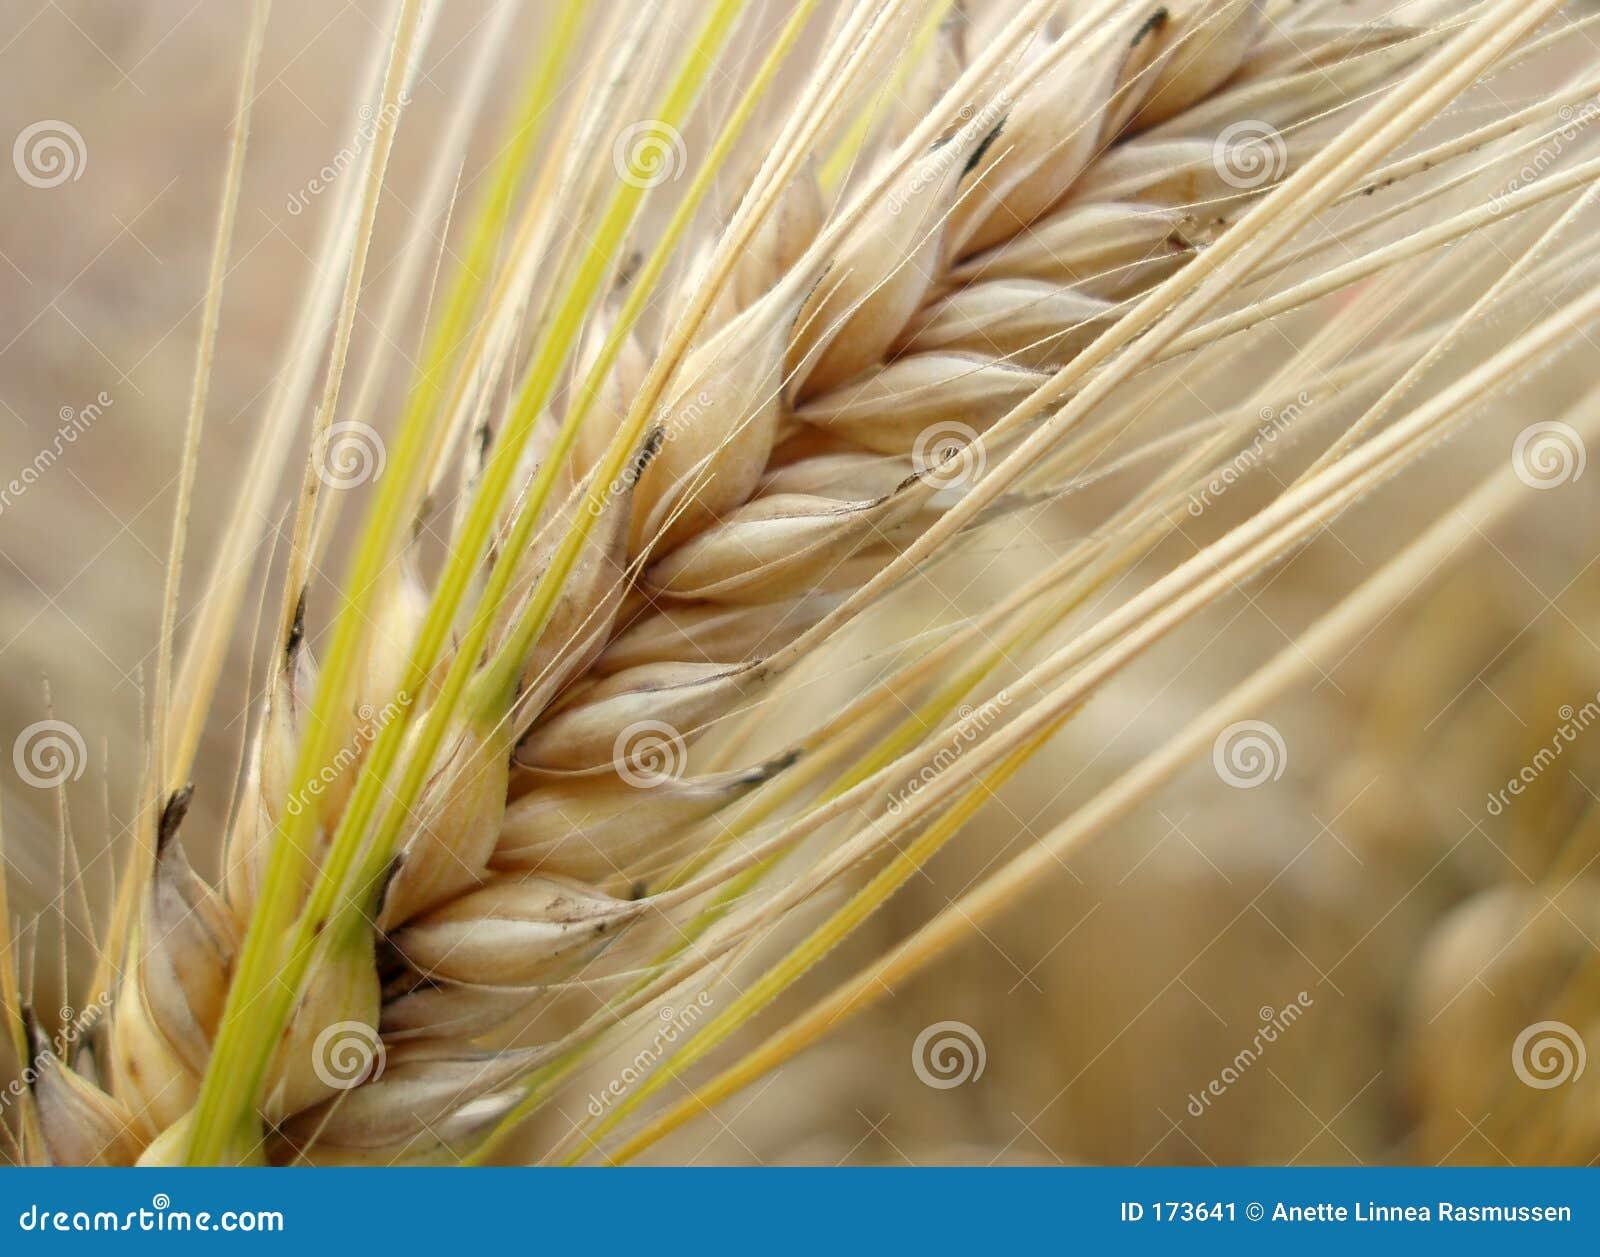 Corn straw